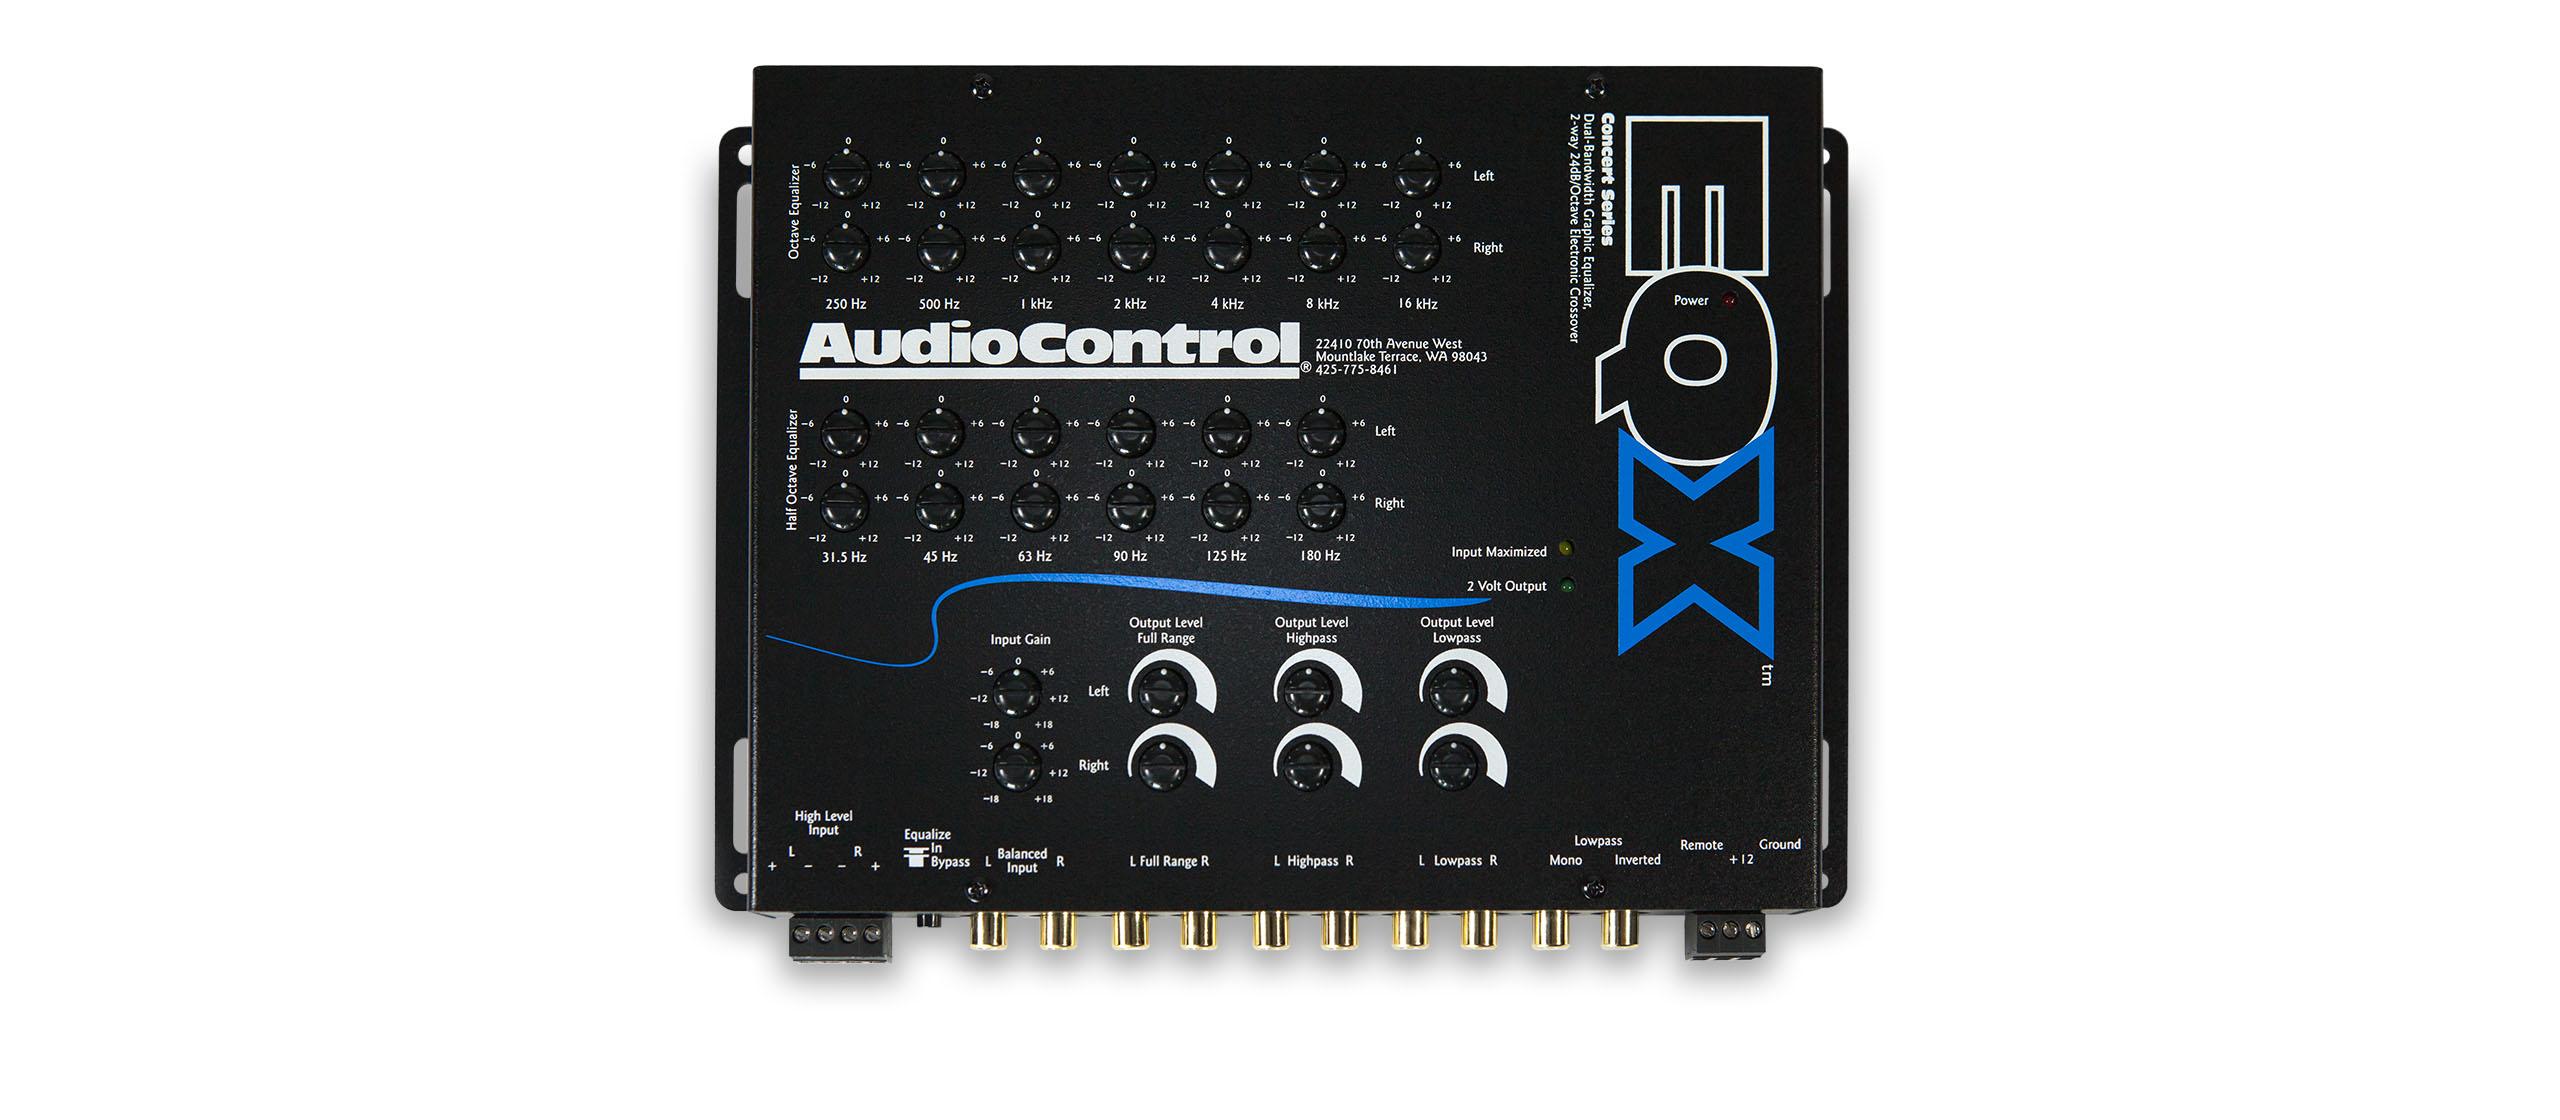 AudioControl EQX Car Stereo 2Channel Equalizer Crossover EQ Audio Control New